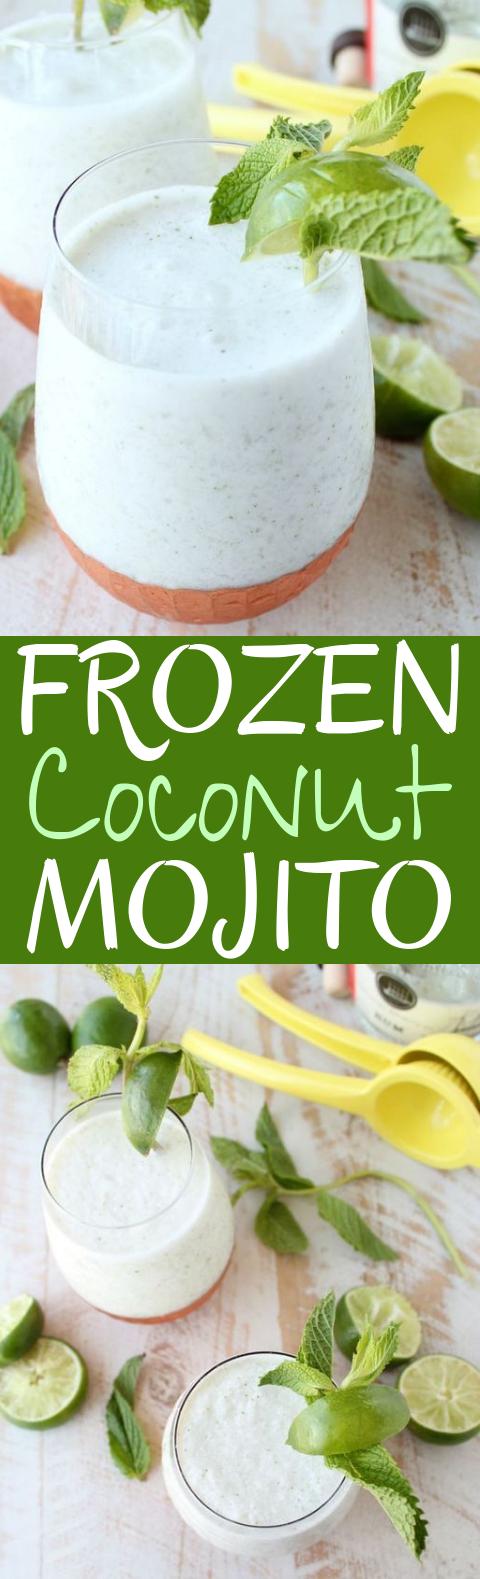 Frozen Coconut Mojito #drinks #cocktails